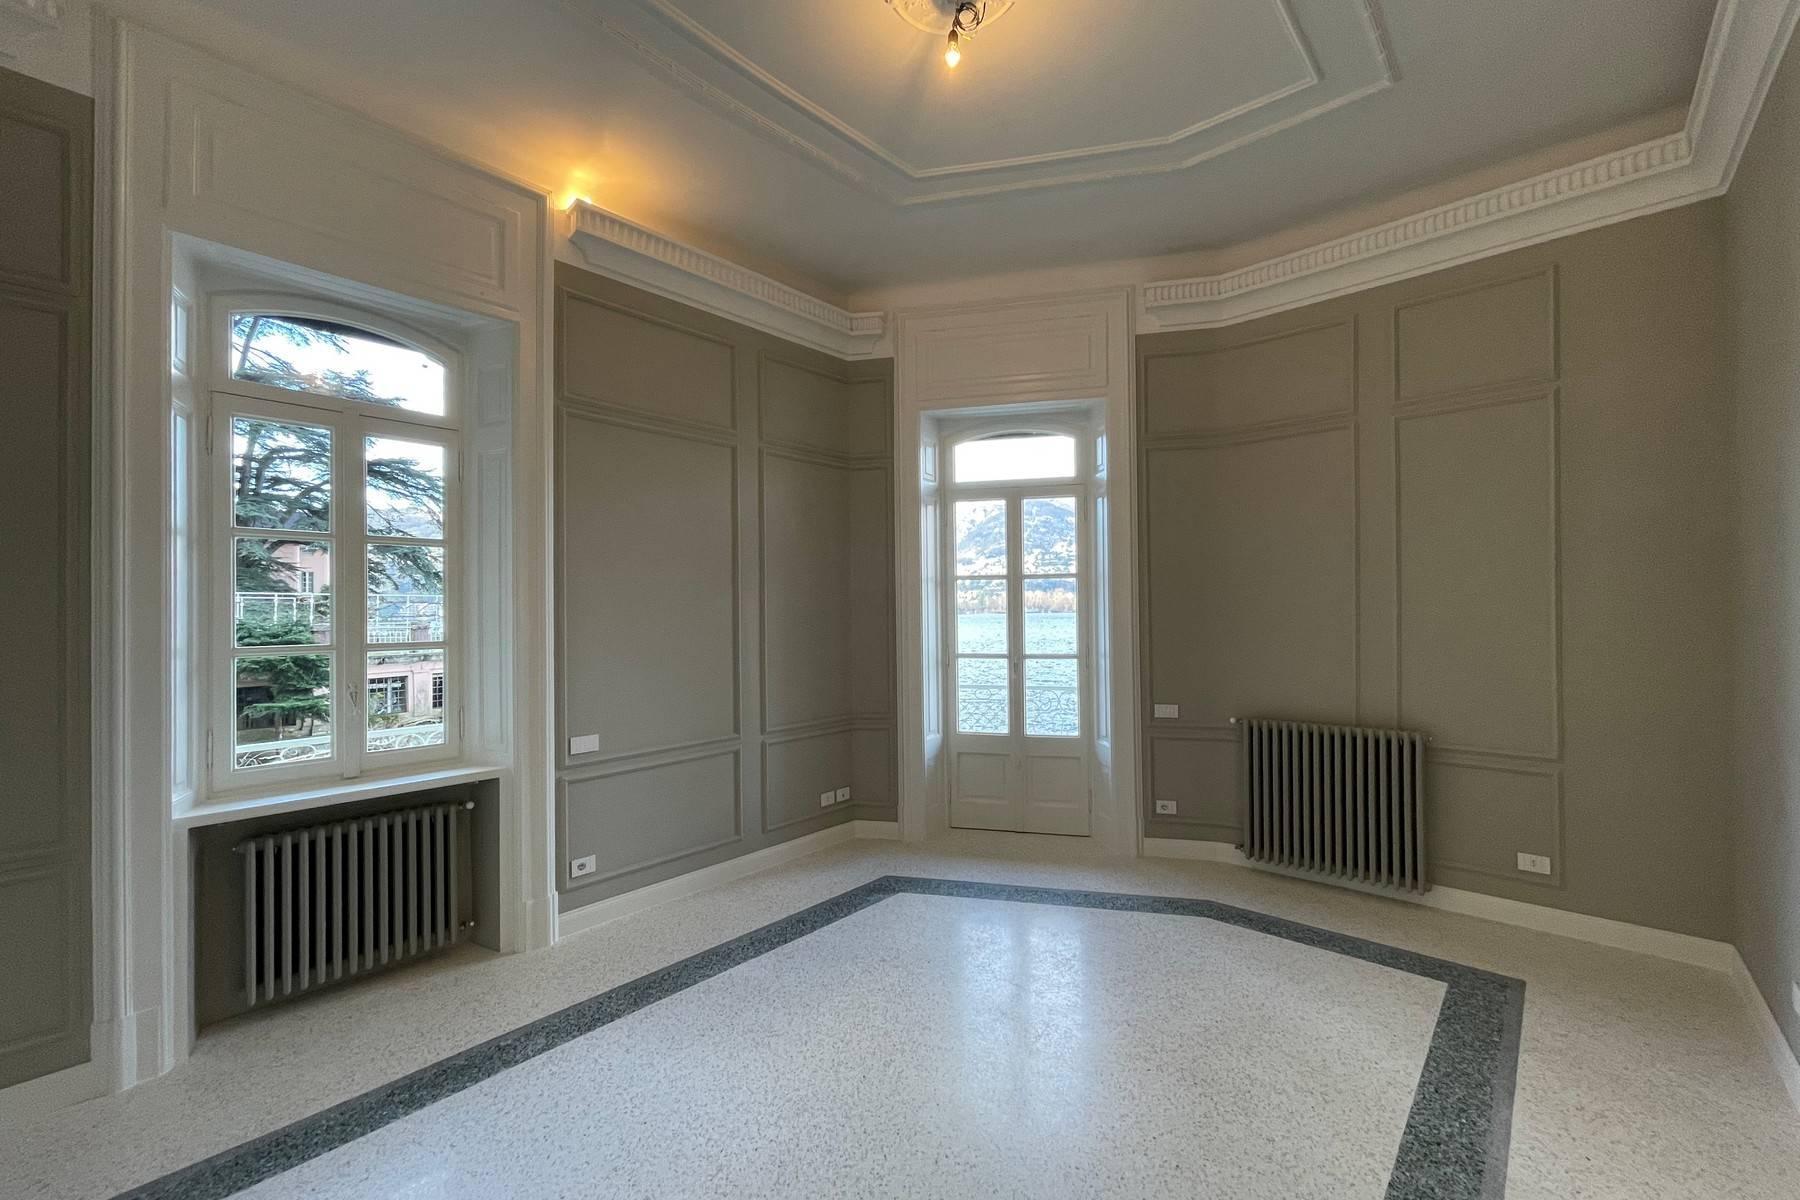 Maestosa Villa in stile Liberty - 10